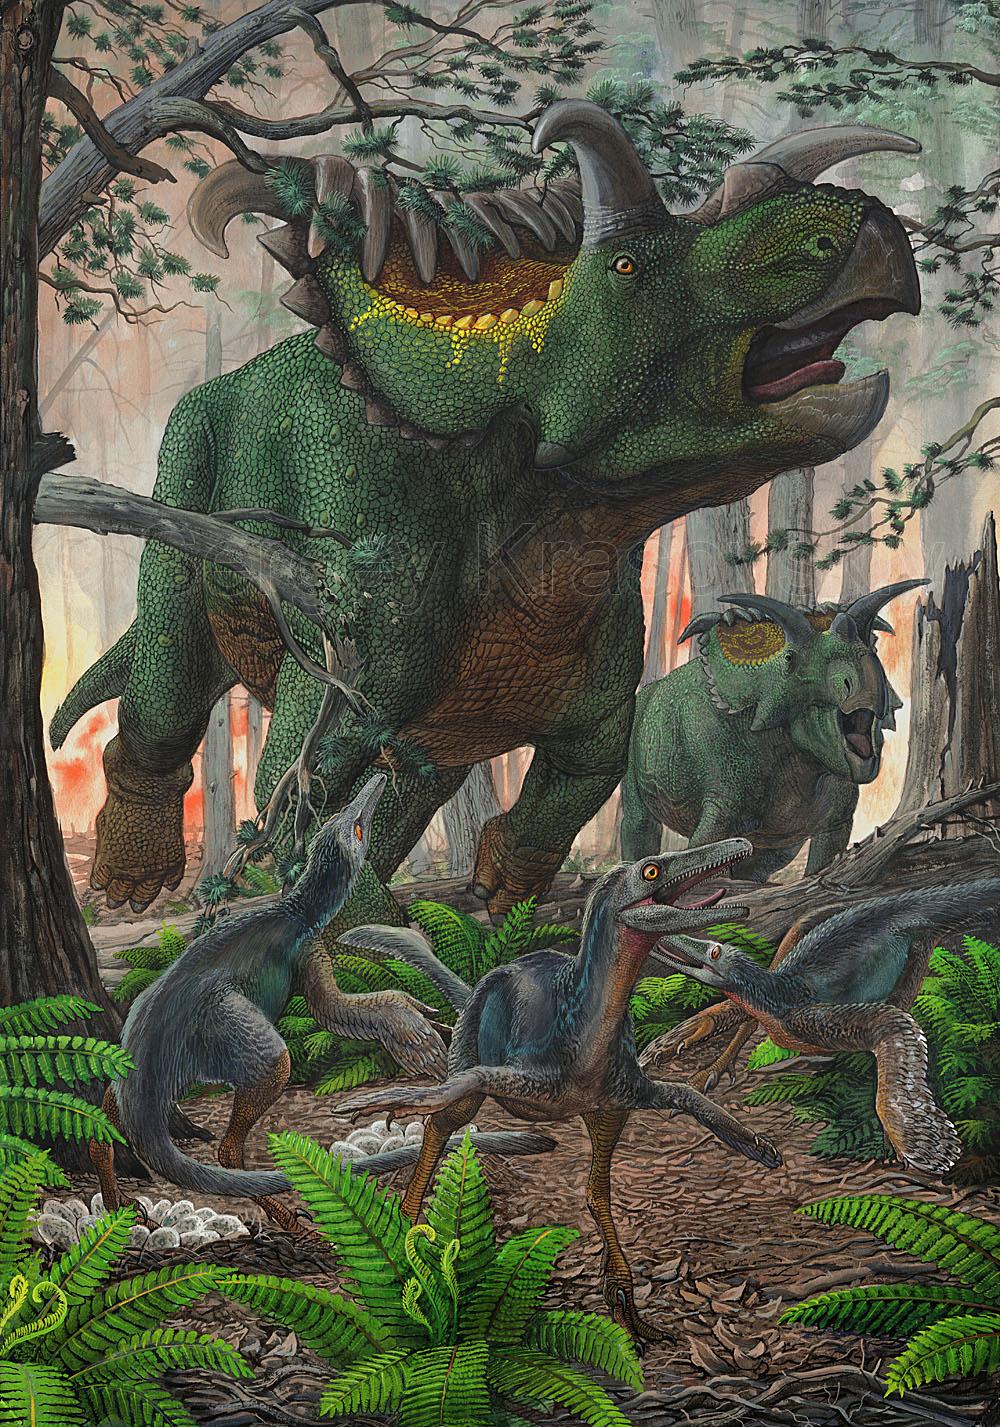 Kosmoceratops and talos by atrox1